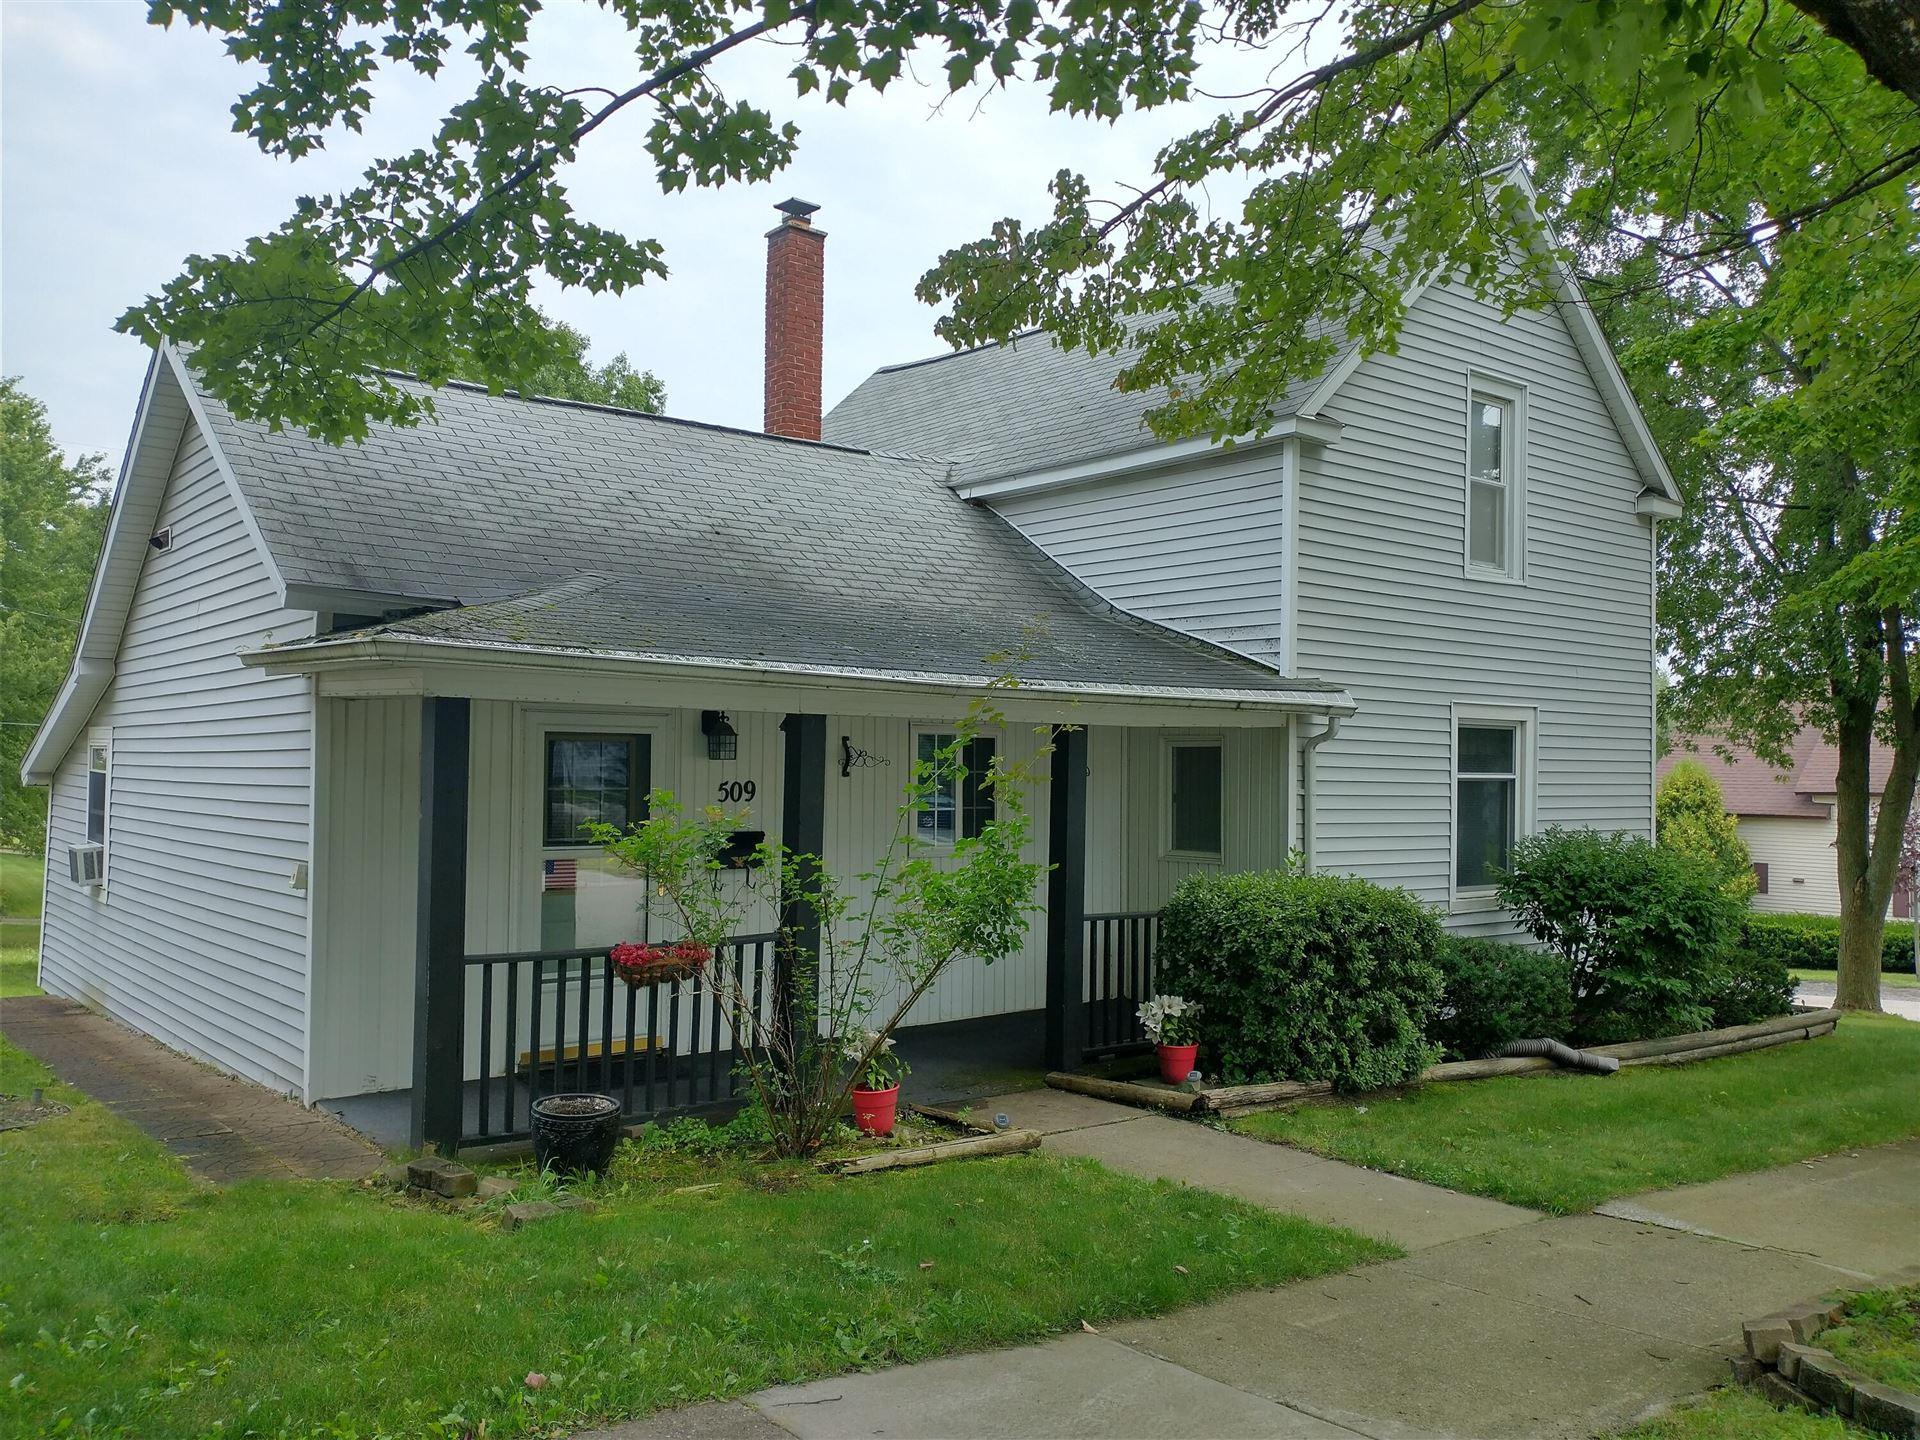 509 Fifth Street, Ludington, MI 49431 - MLS#: 21099398